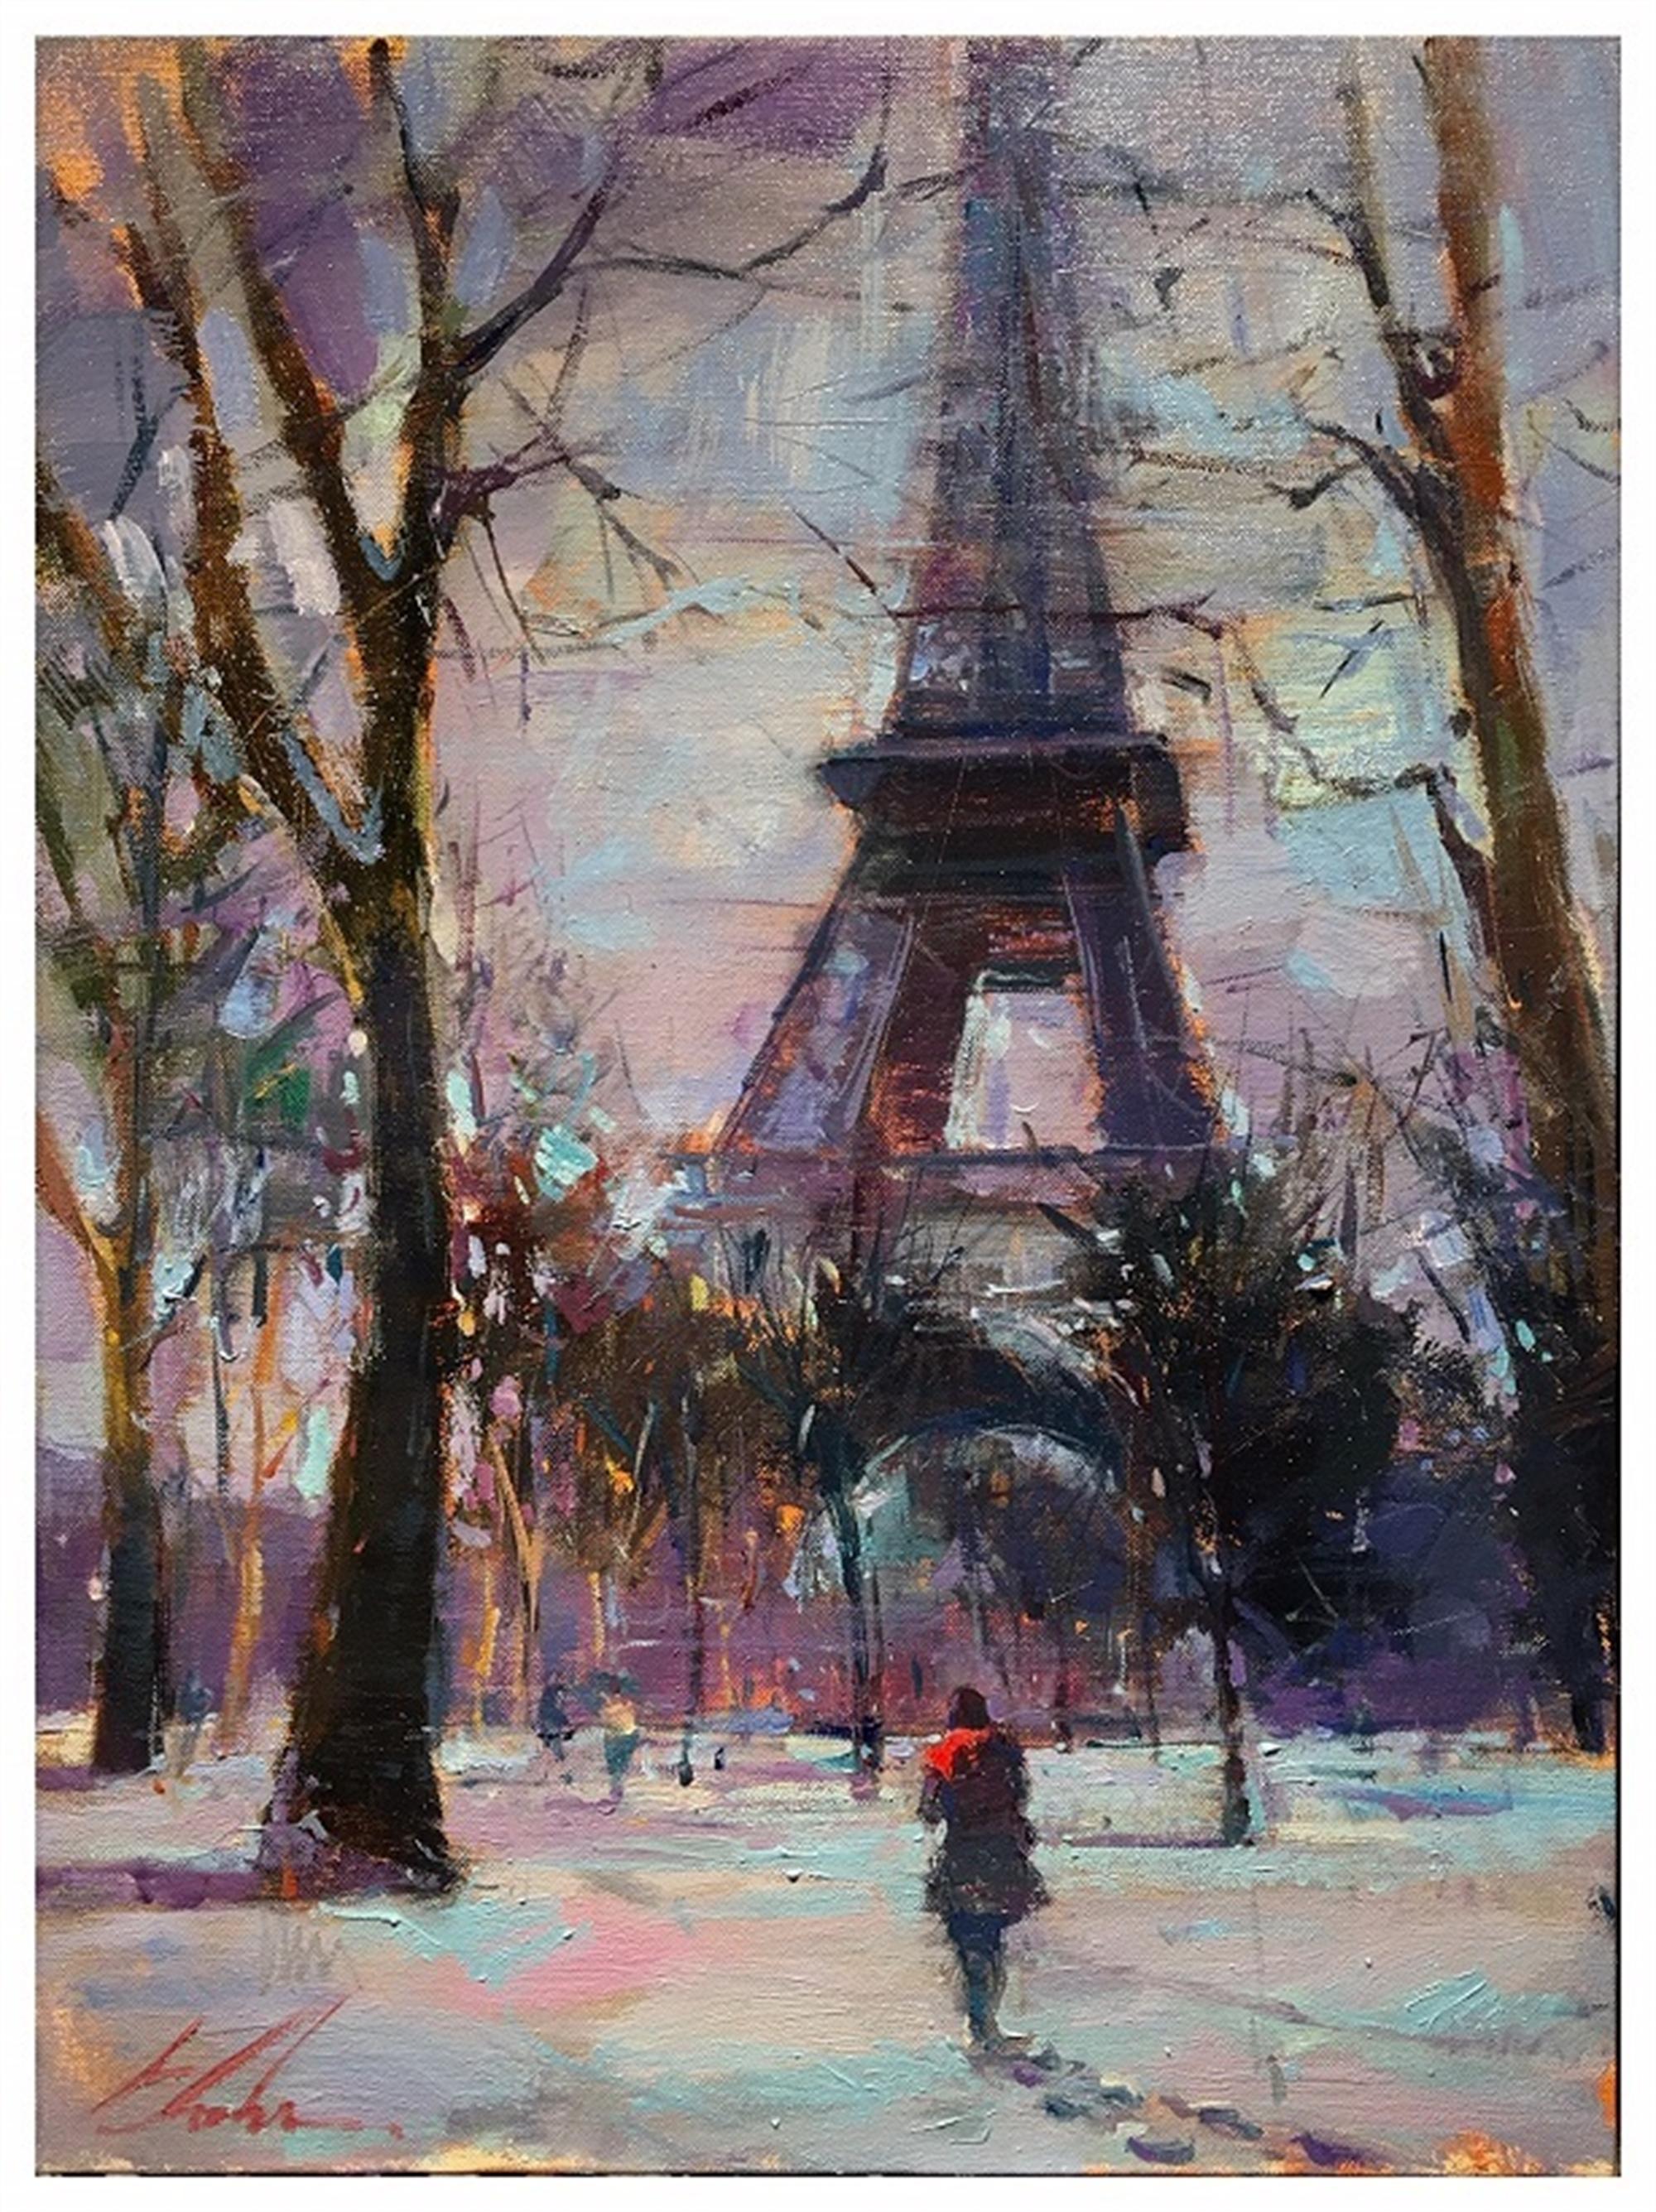 Winter in Paris by Michael Flohr